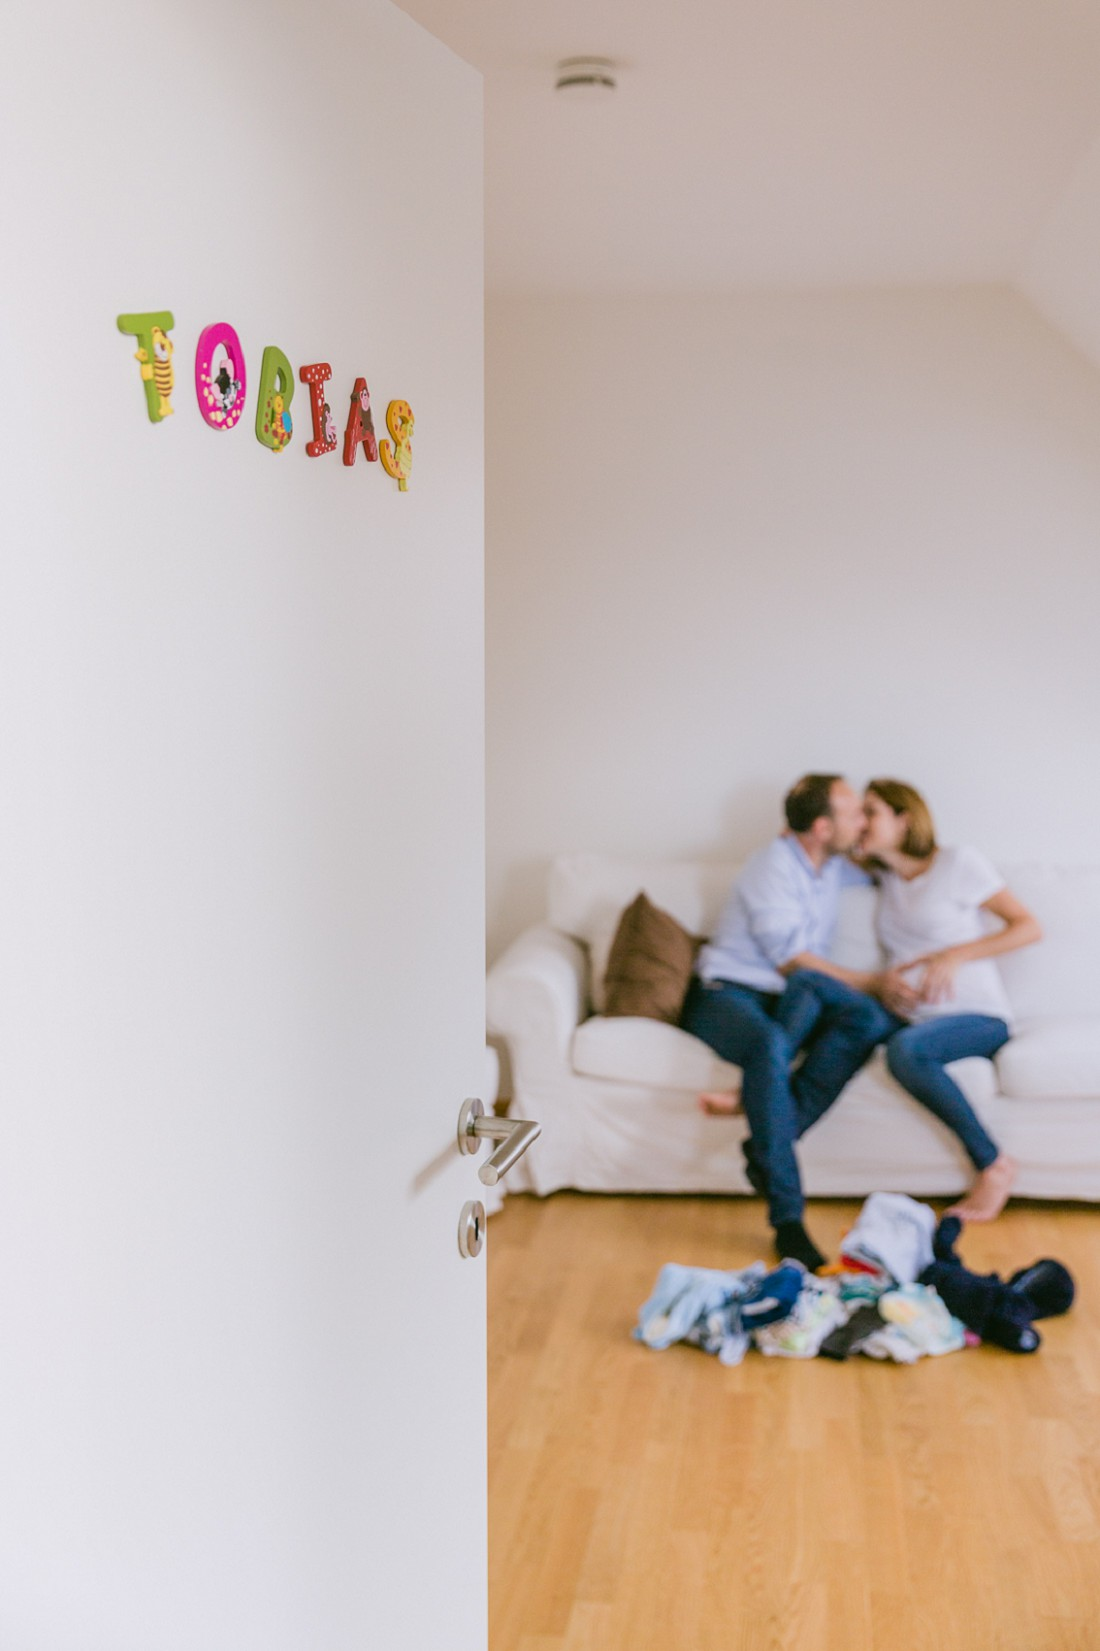 Babybauchfotos, Schwangerschaftsfotos, Portraitfotos, Dorelies Hofer, Wien, Niederösterrreich, Baden, Gaaden, Perchtoldsdorf, Mödling